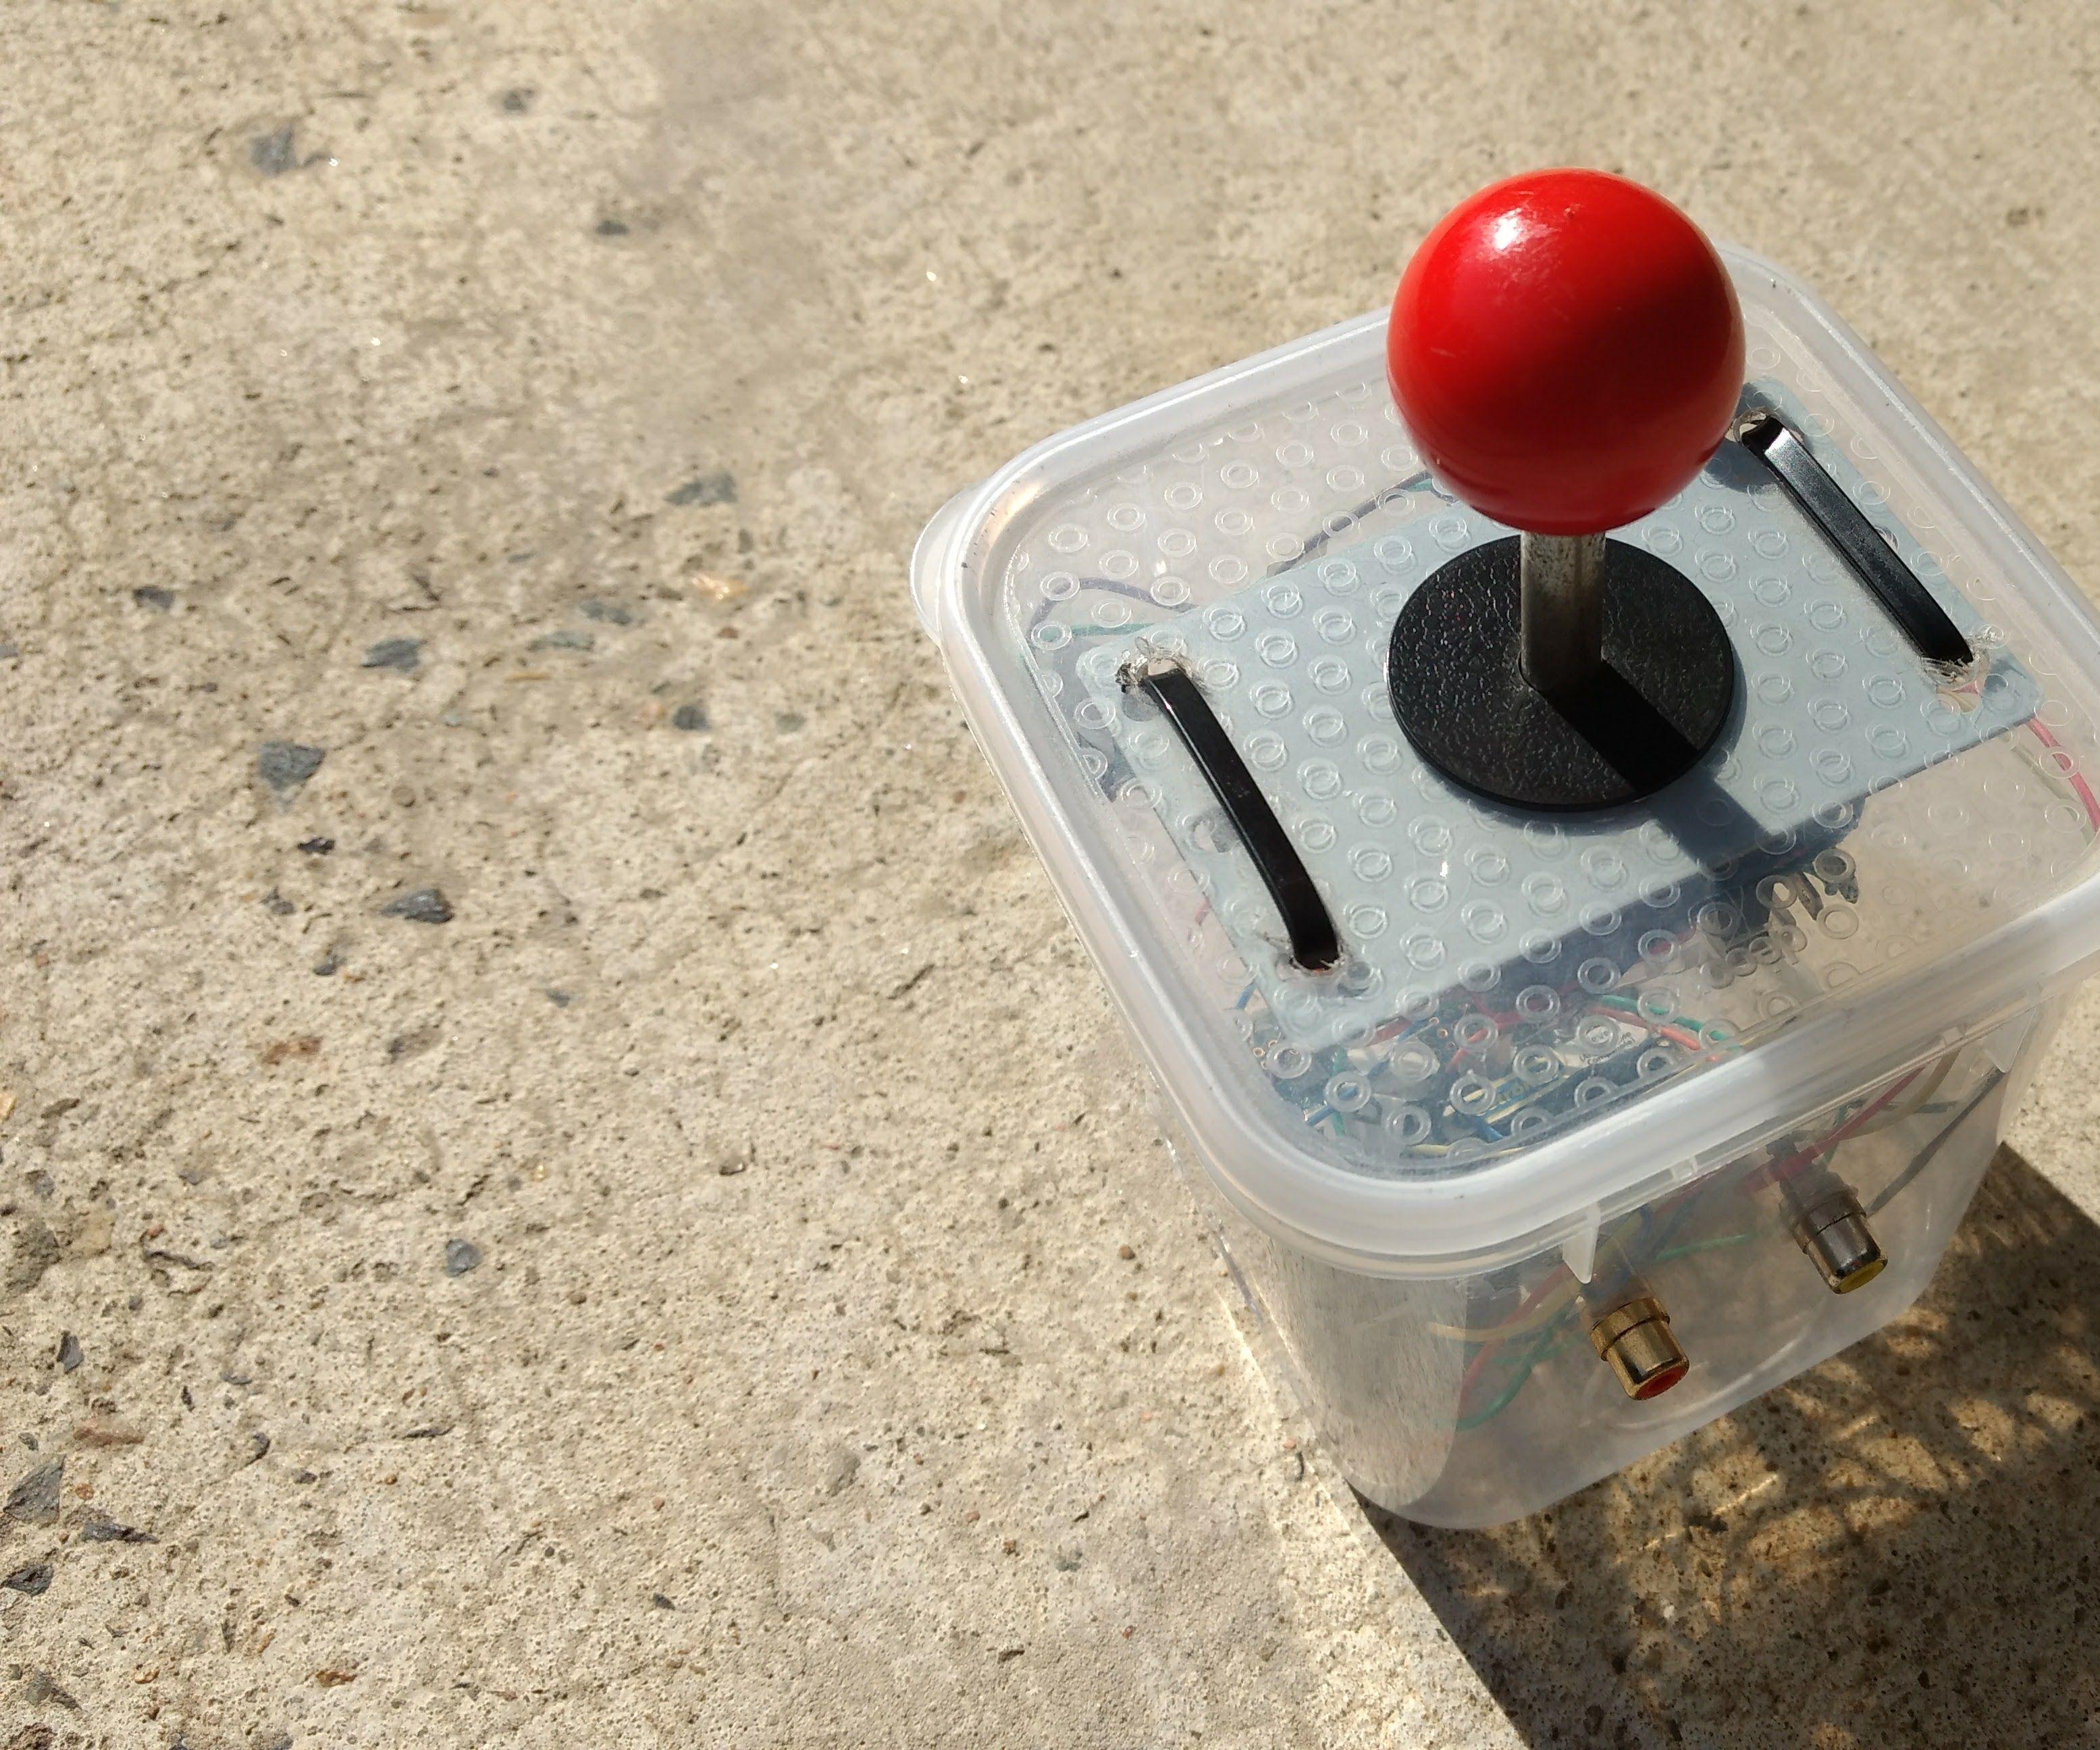 Making a Portable Retro Game Console using Arduino